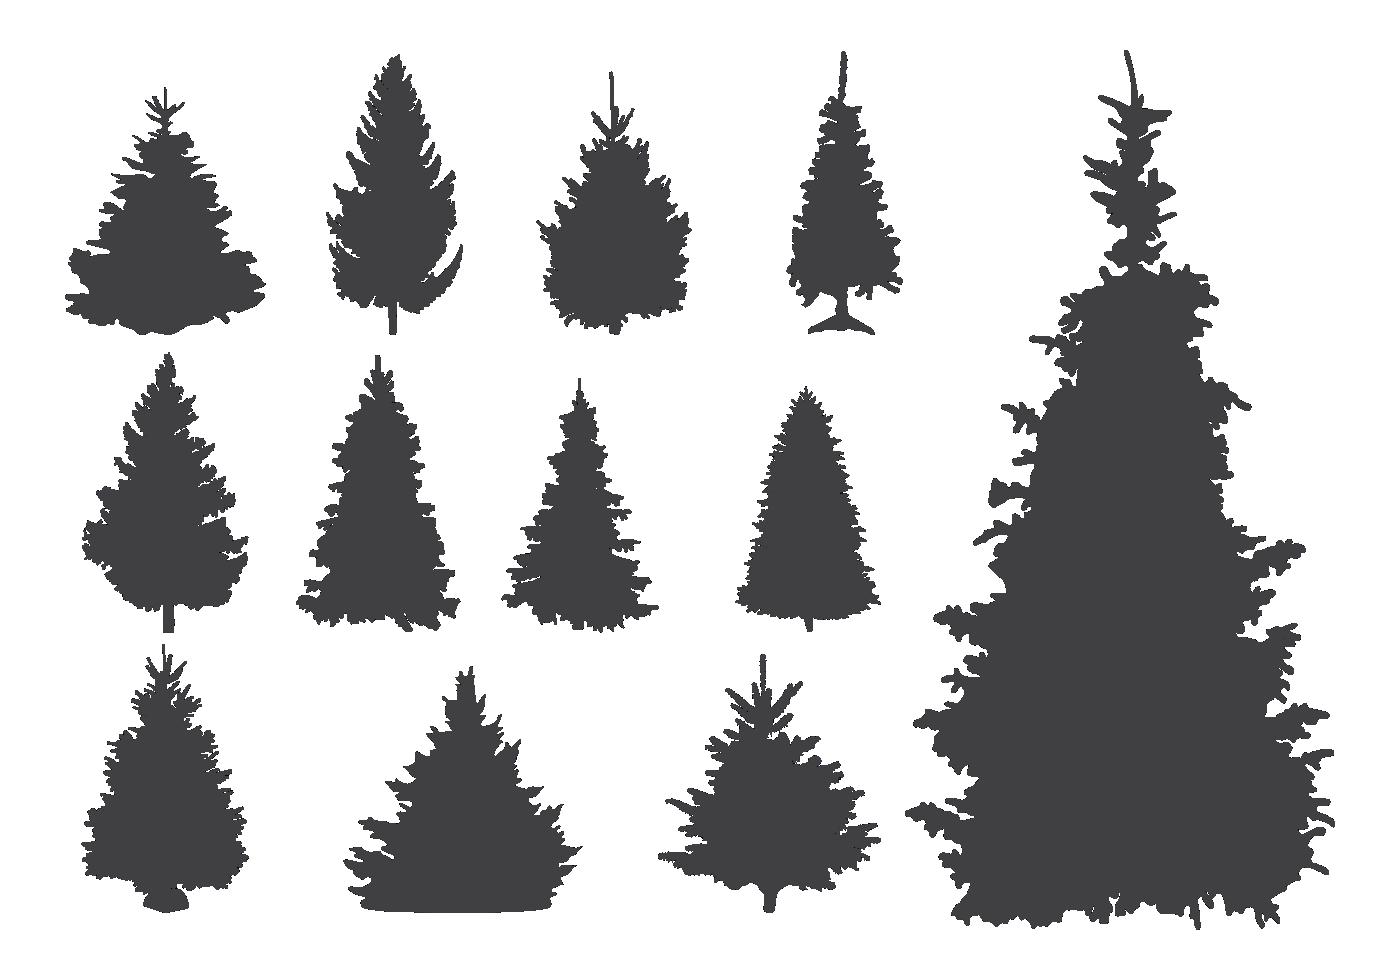 Bare Christmas Tree Svg.Pine Tree Free Vector Art 22 277 Free Downloads